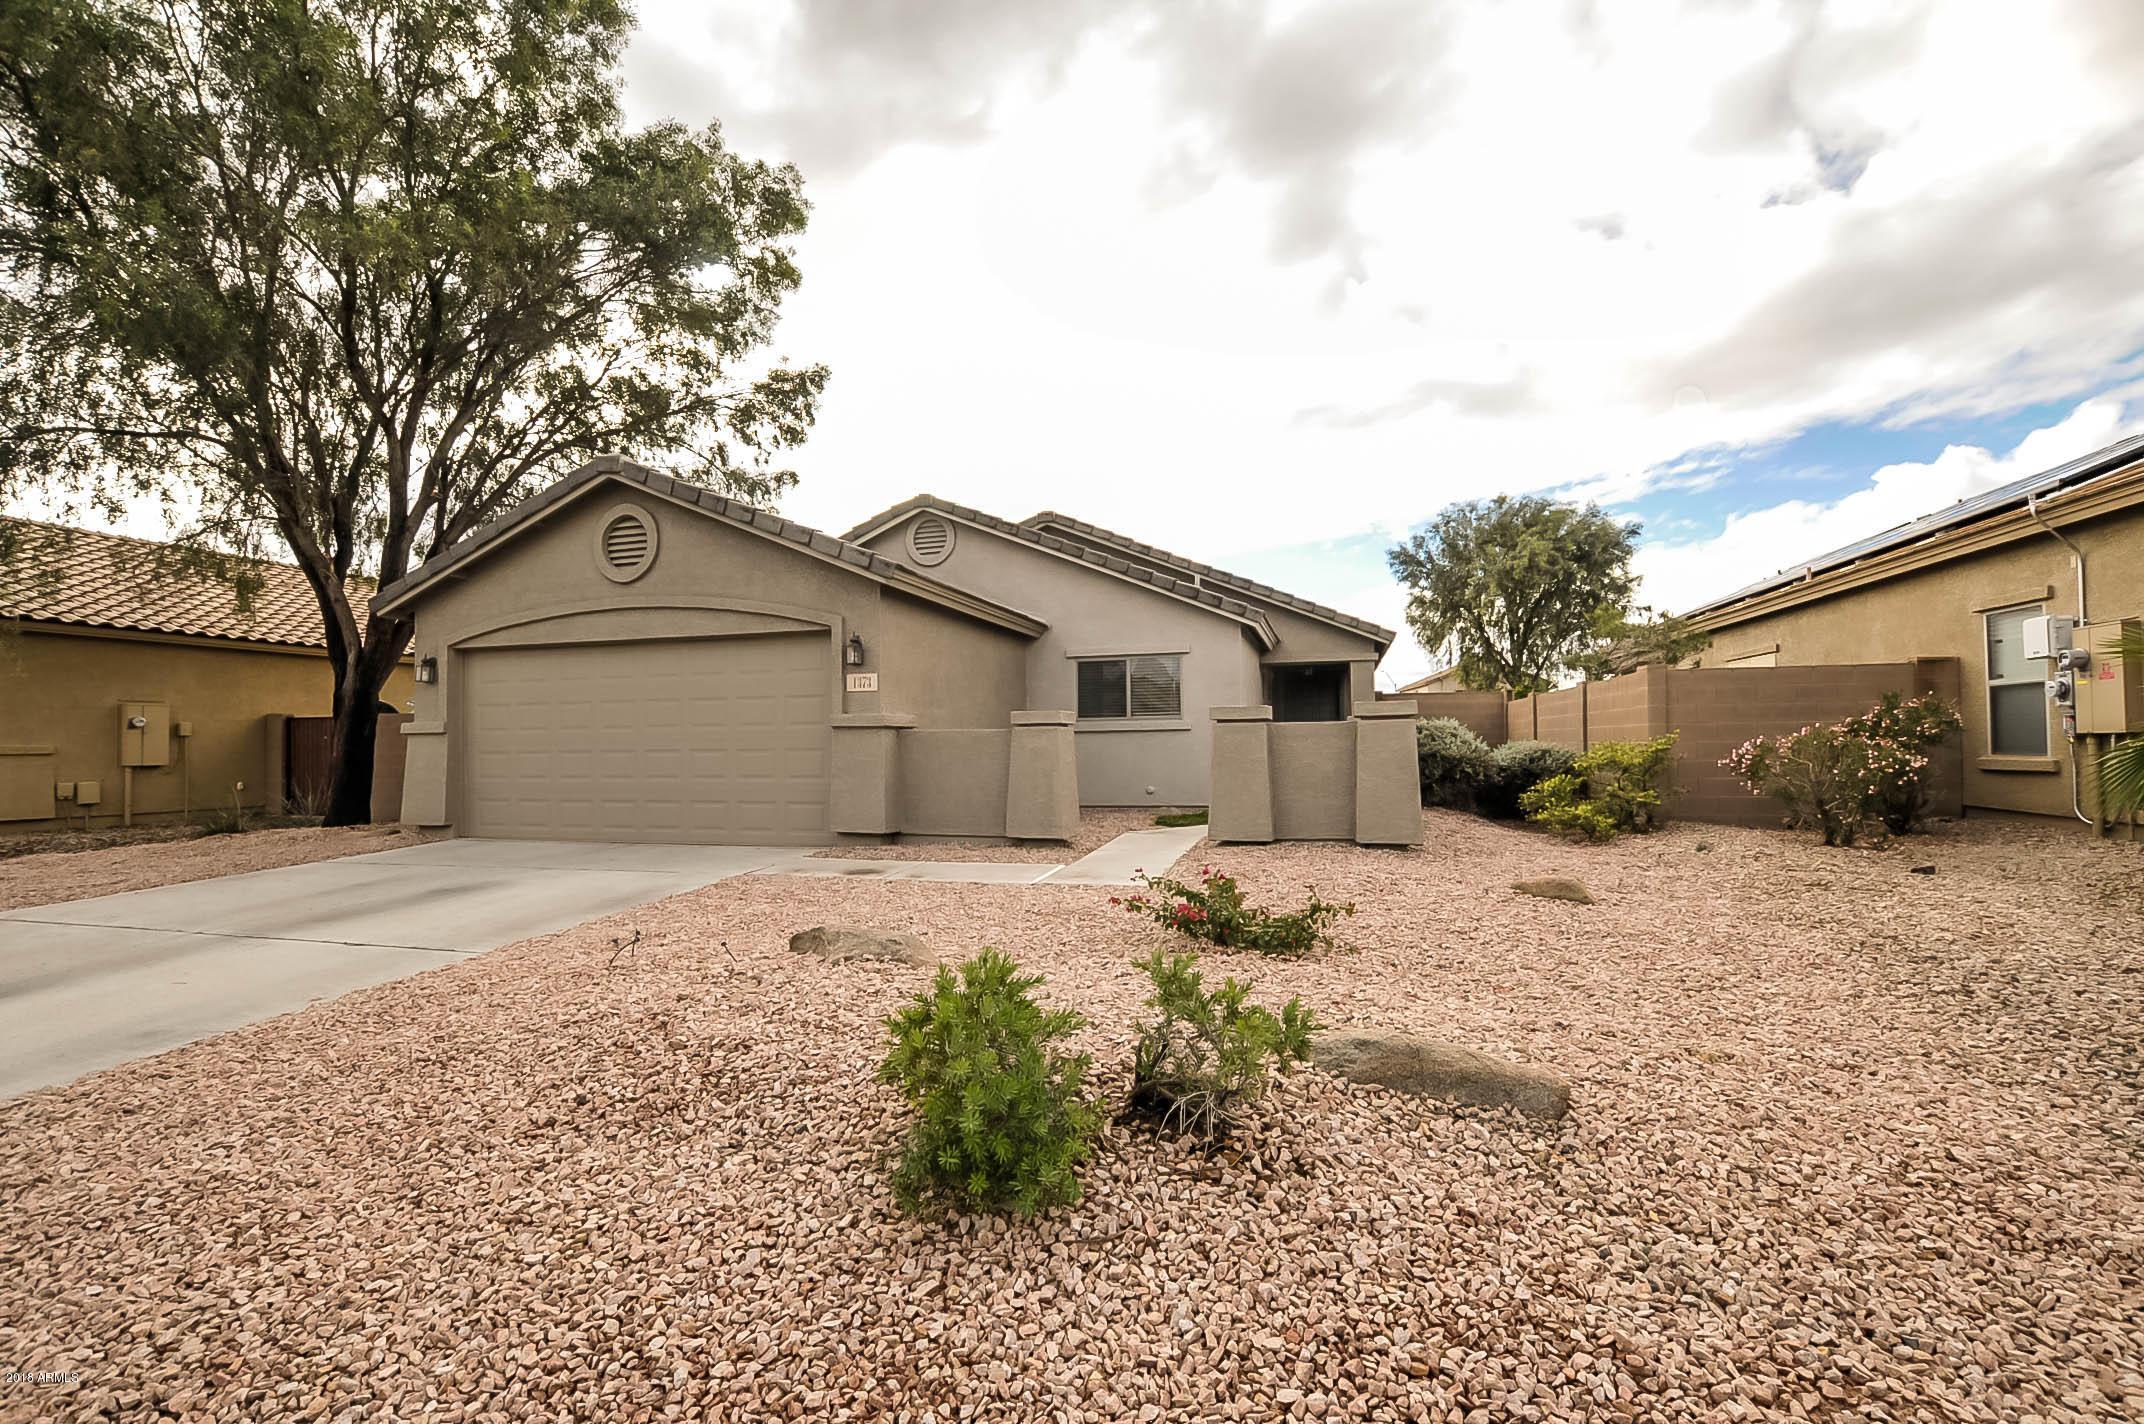 Photo for 1373 E Linda Drive, Casa Grande, AZ 85122 (MLS # 5853365)